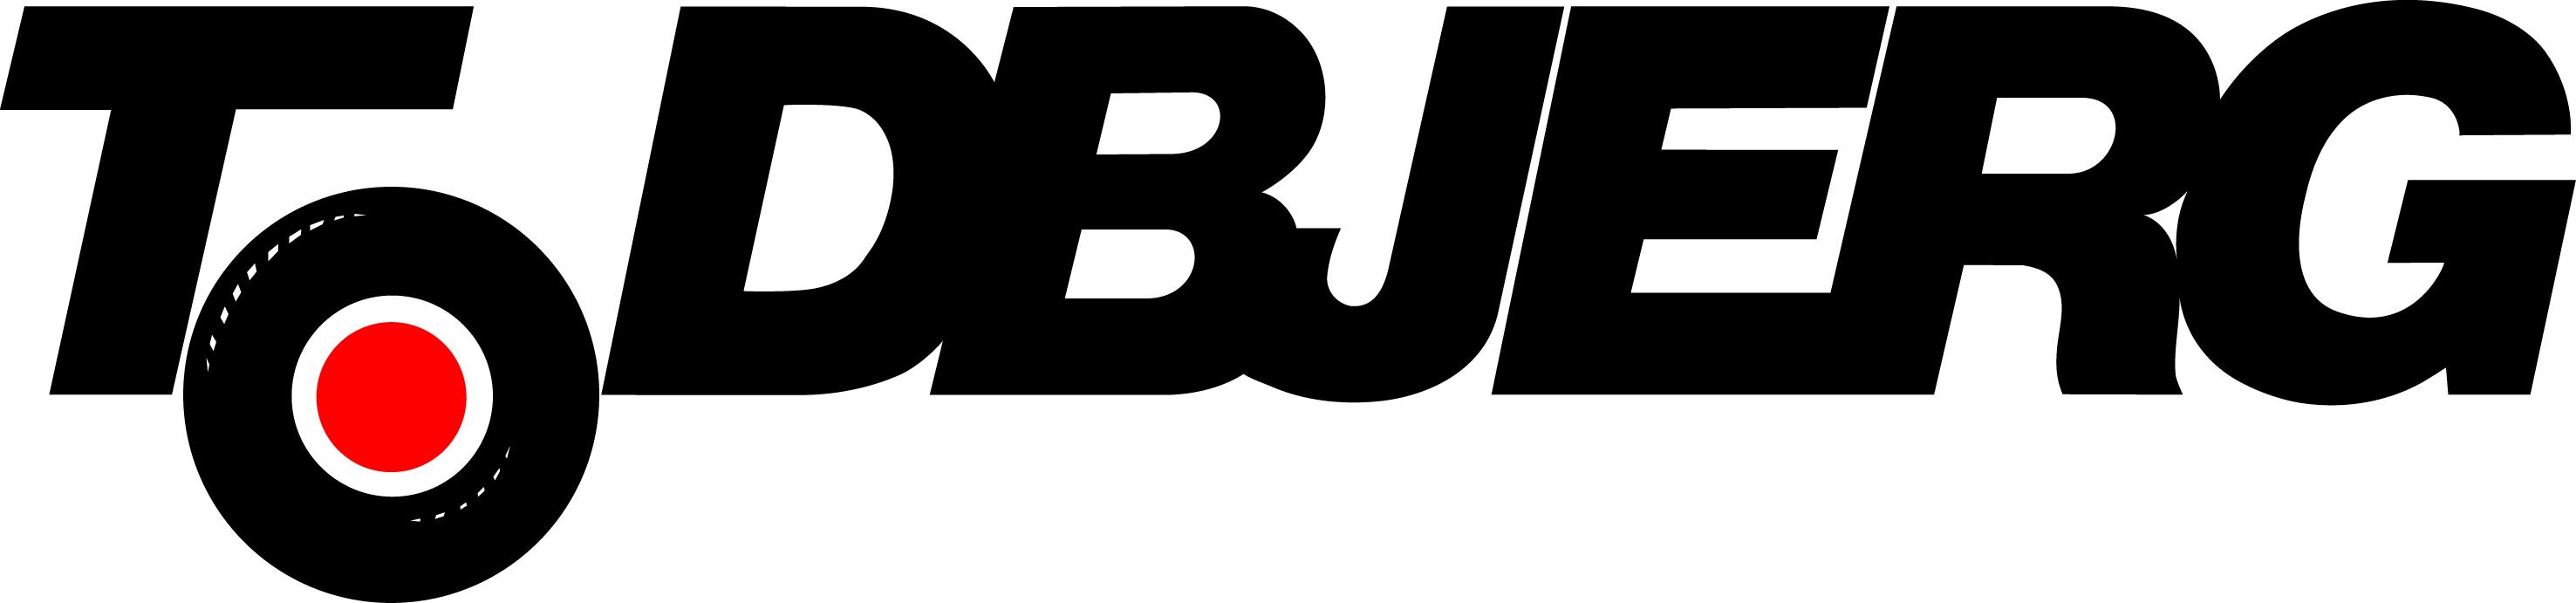 logo stor todbjerg.